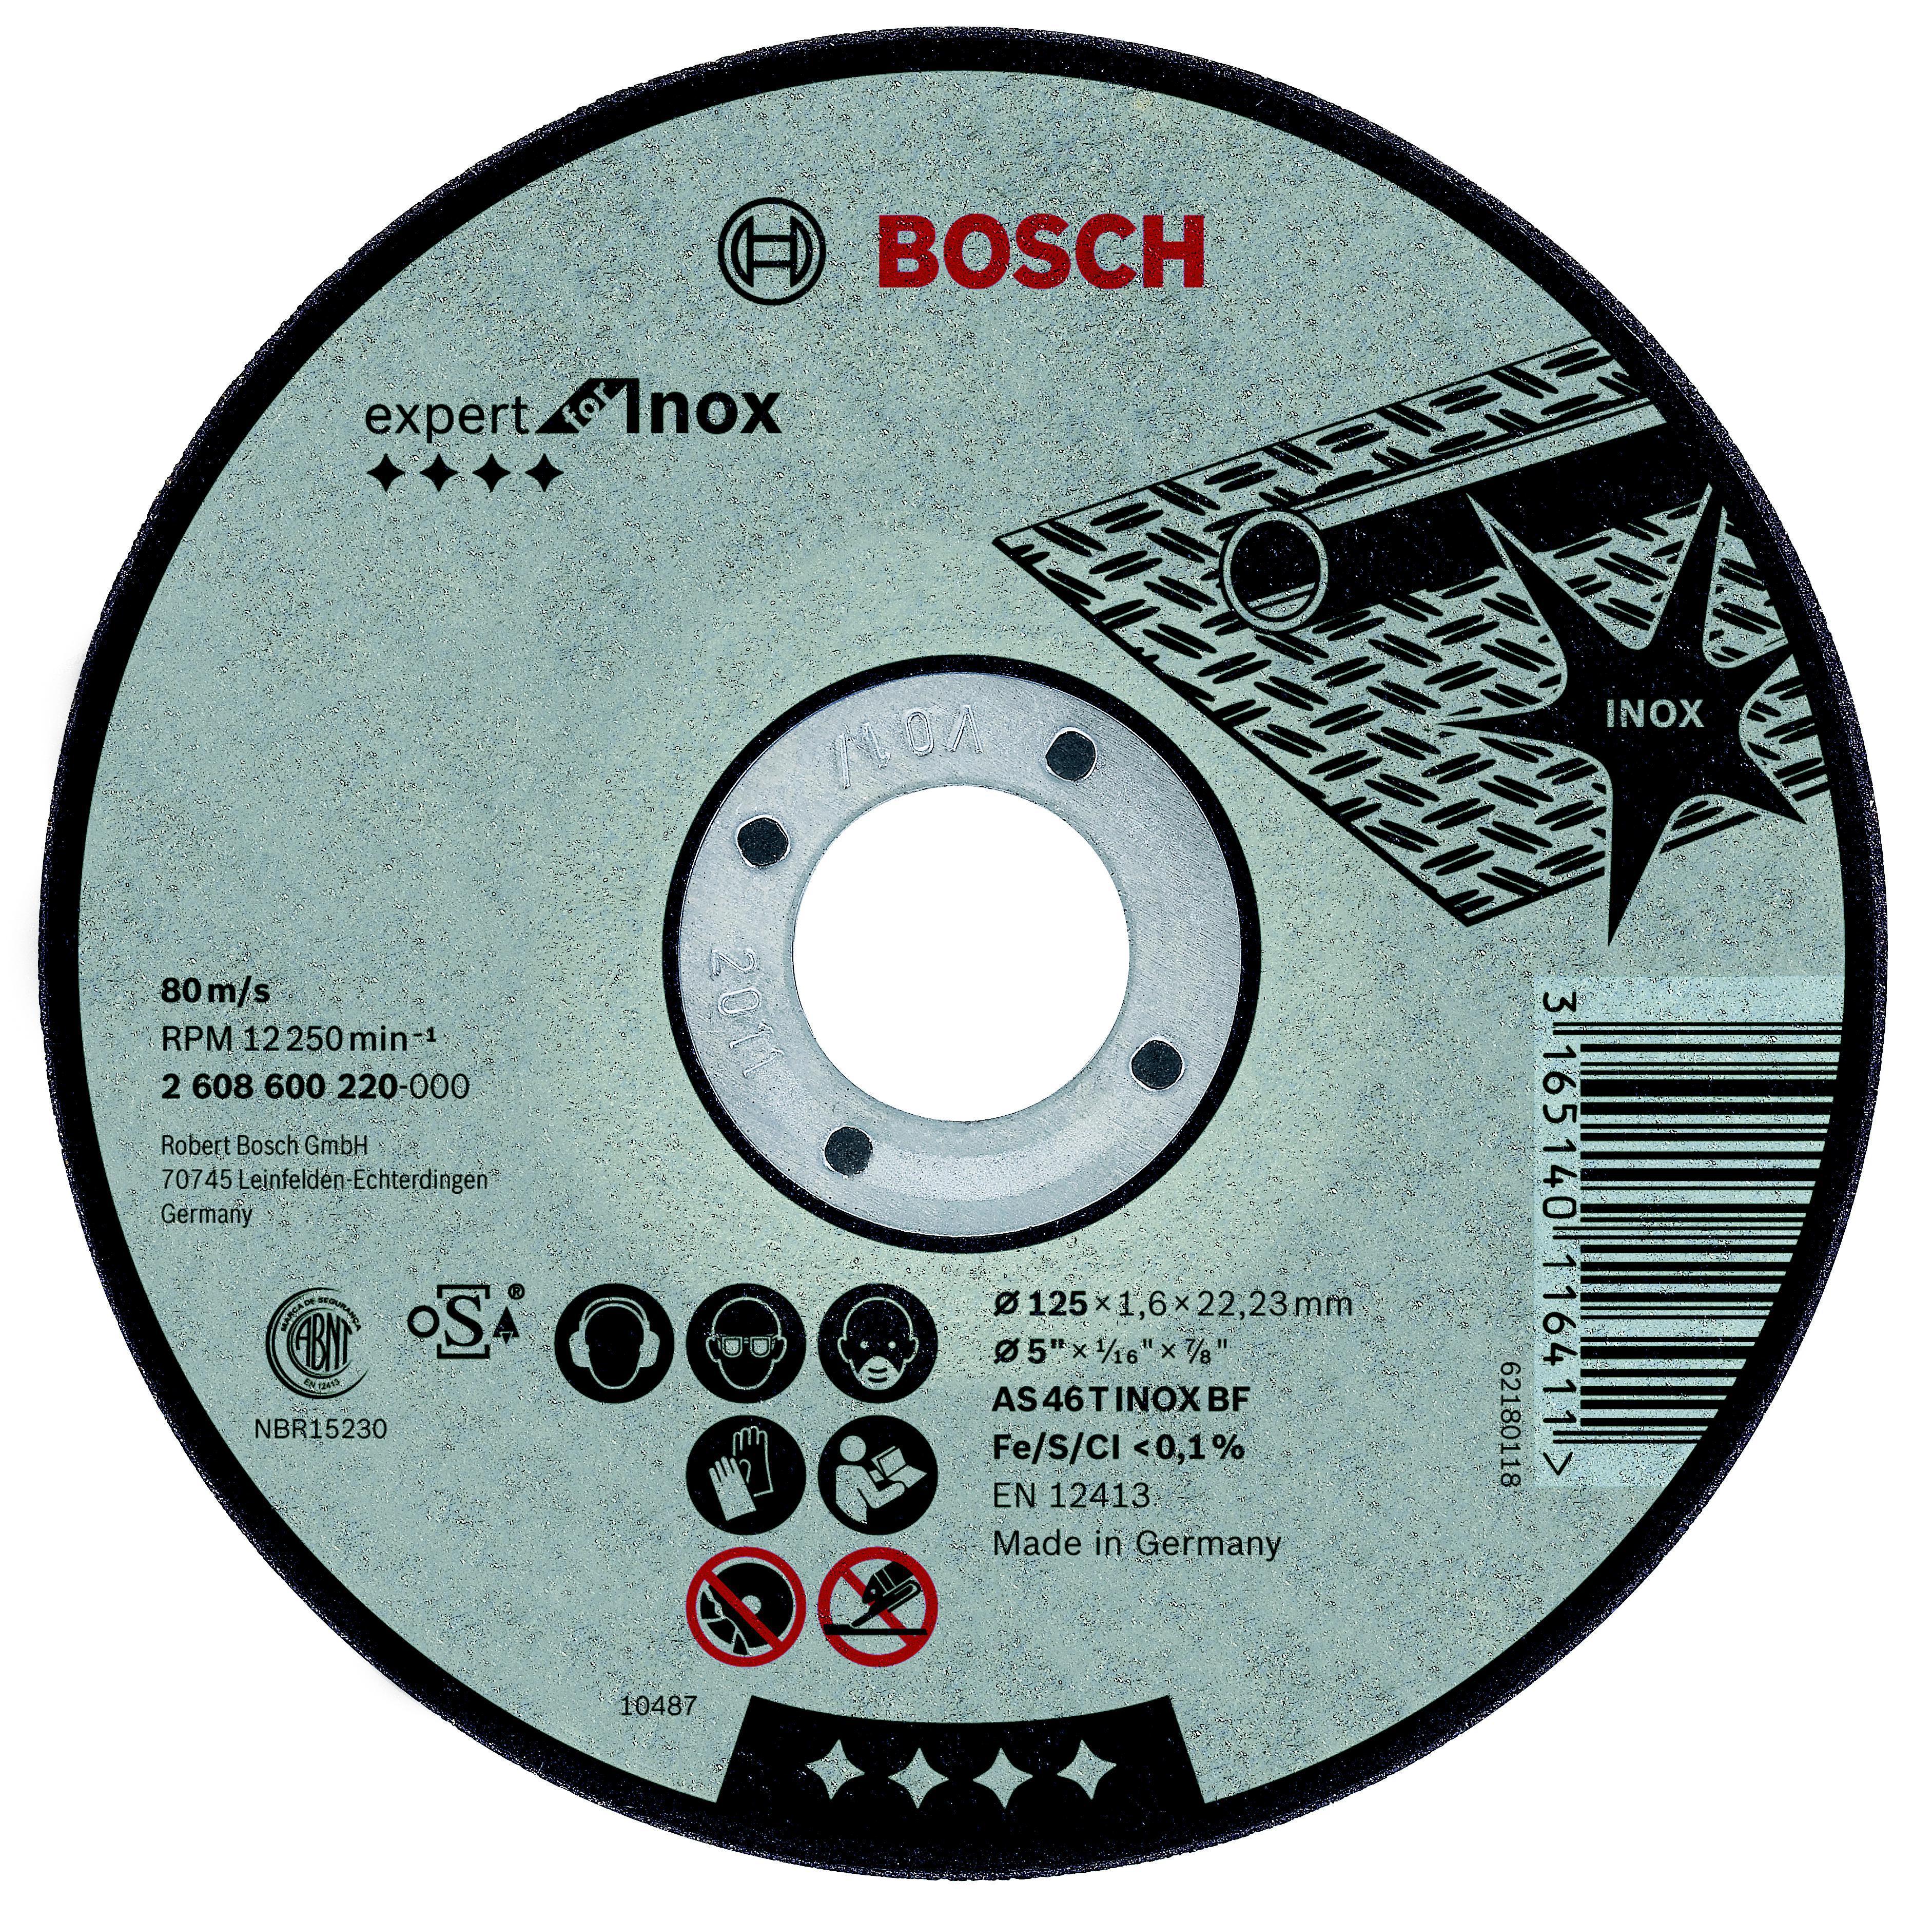 Набор Bosch Круг отрезной 230х2х22 expert for inox (2.608.600.096) круг отрезной klingspor 230х2х22 kronenflex a 24 extra